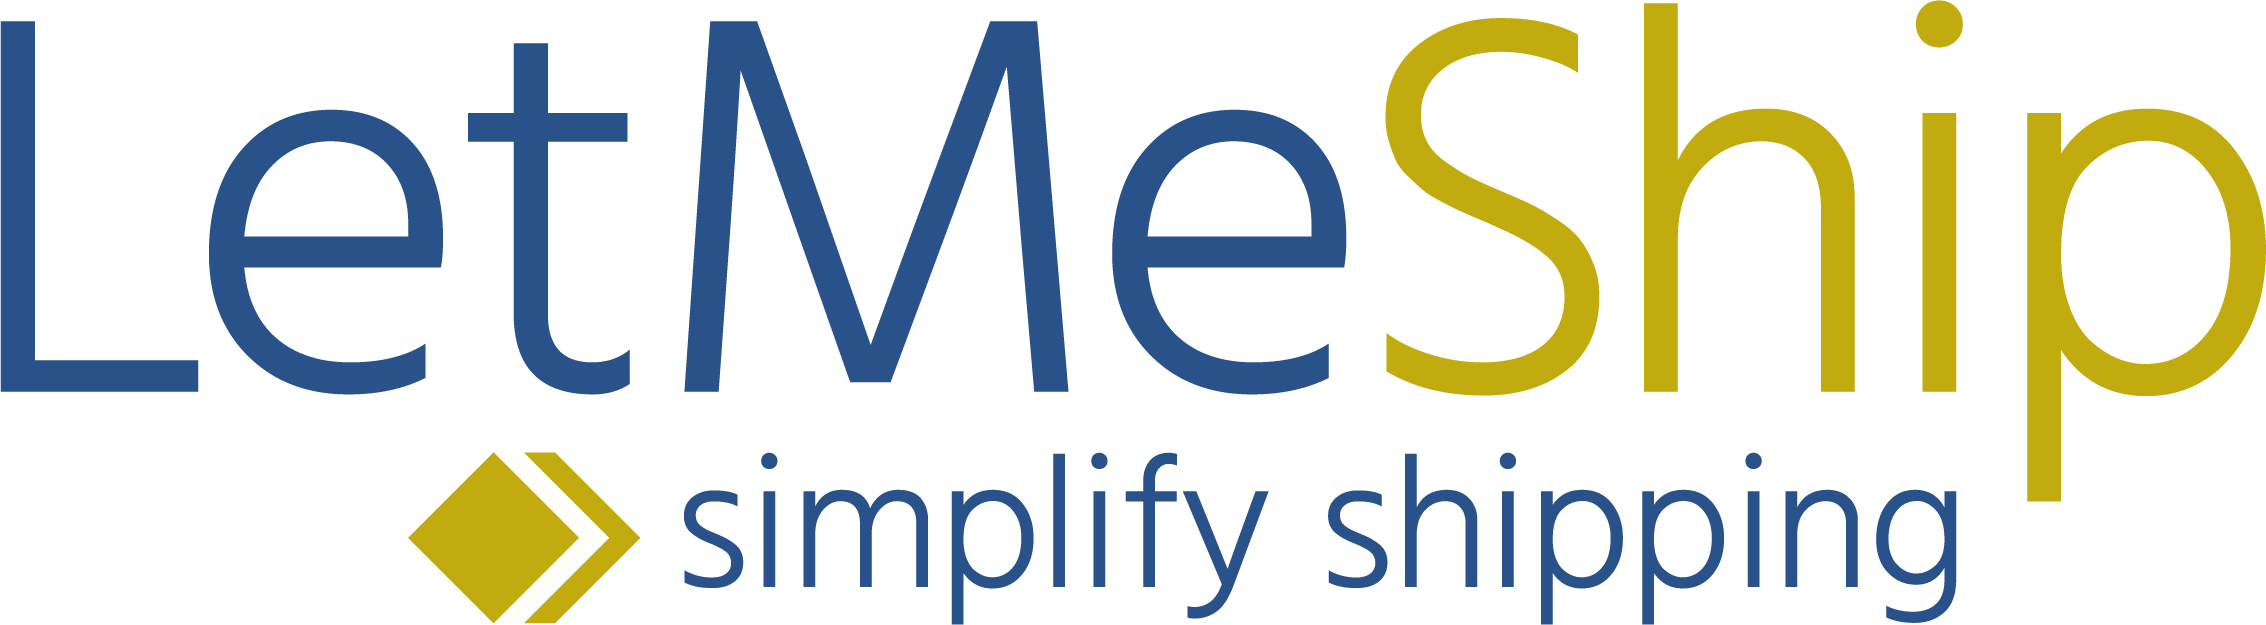 LetMeShip - simplify shipping